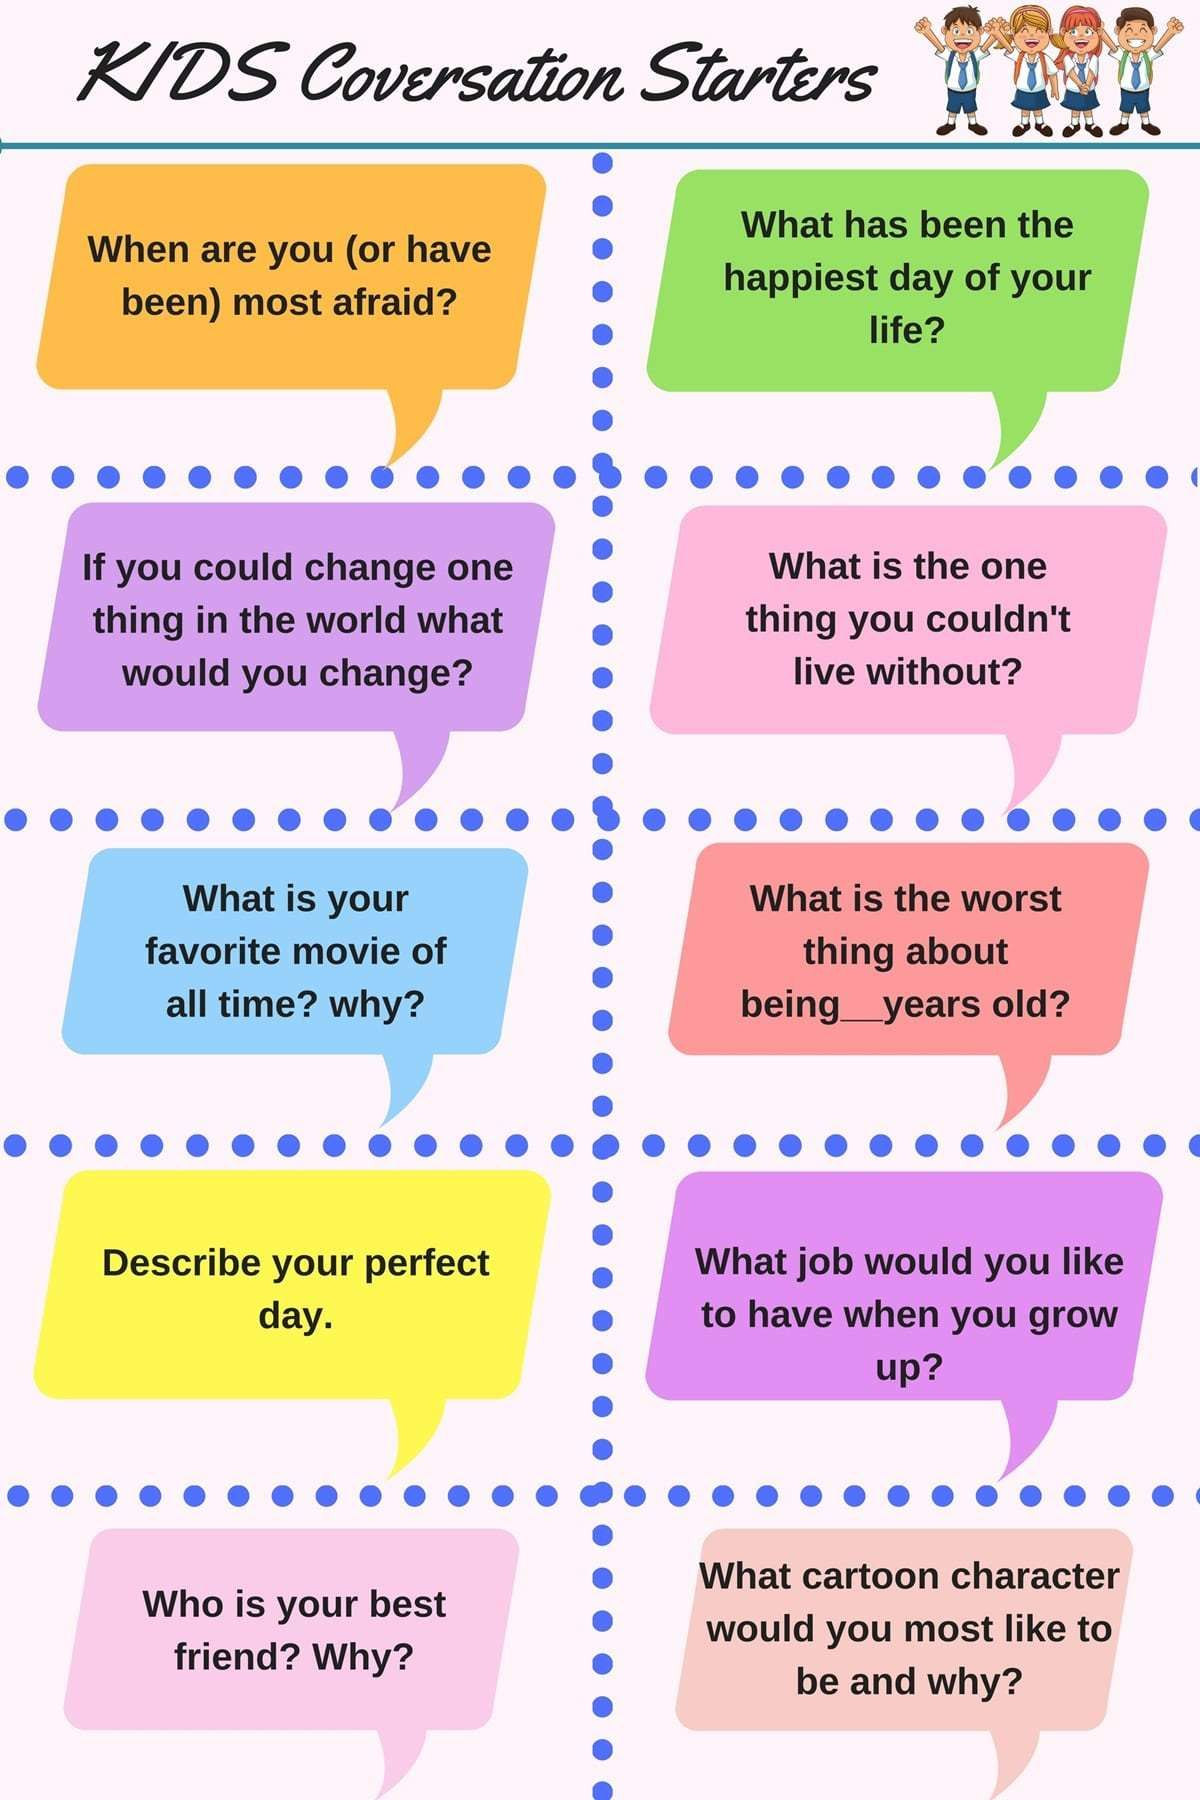 Kids Conversation Starters